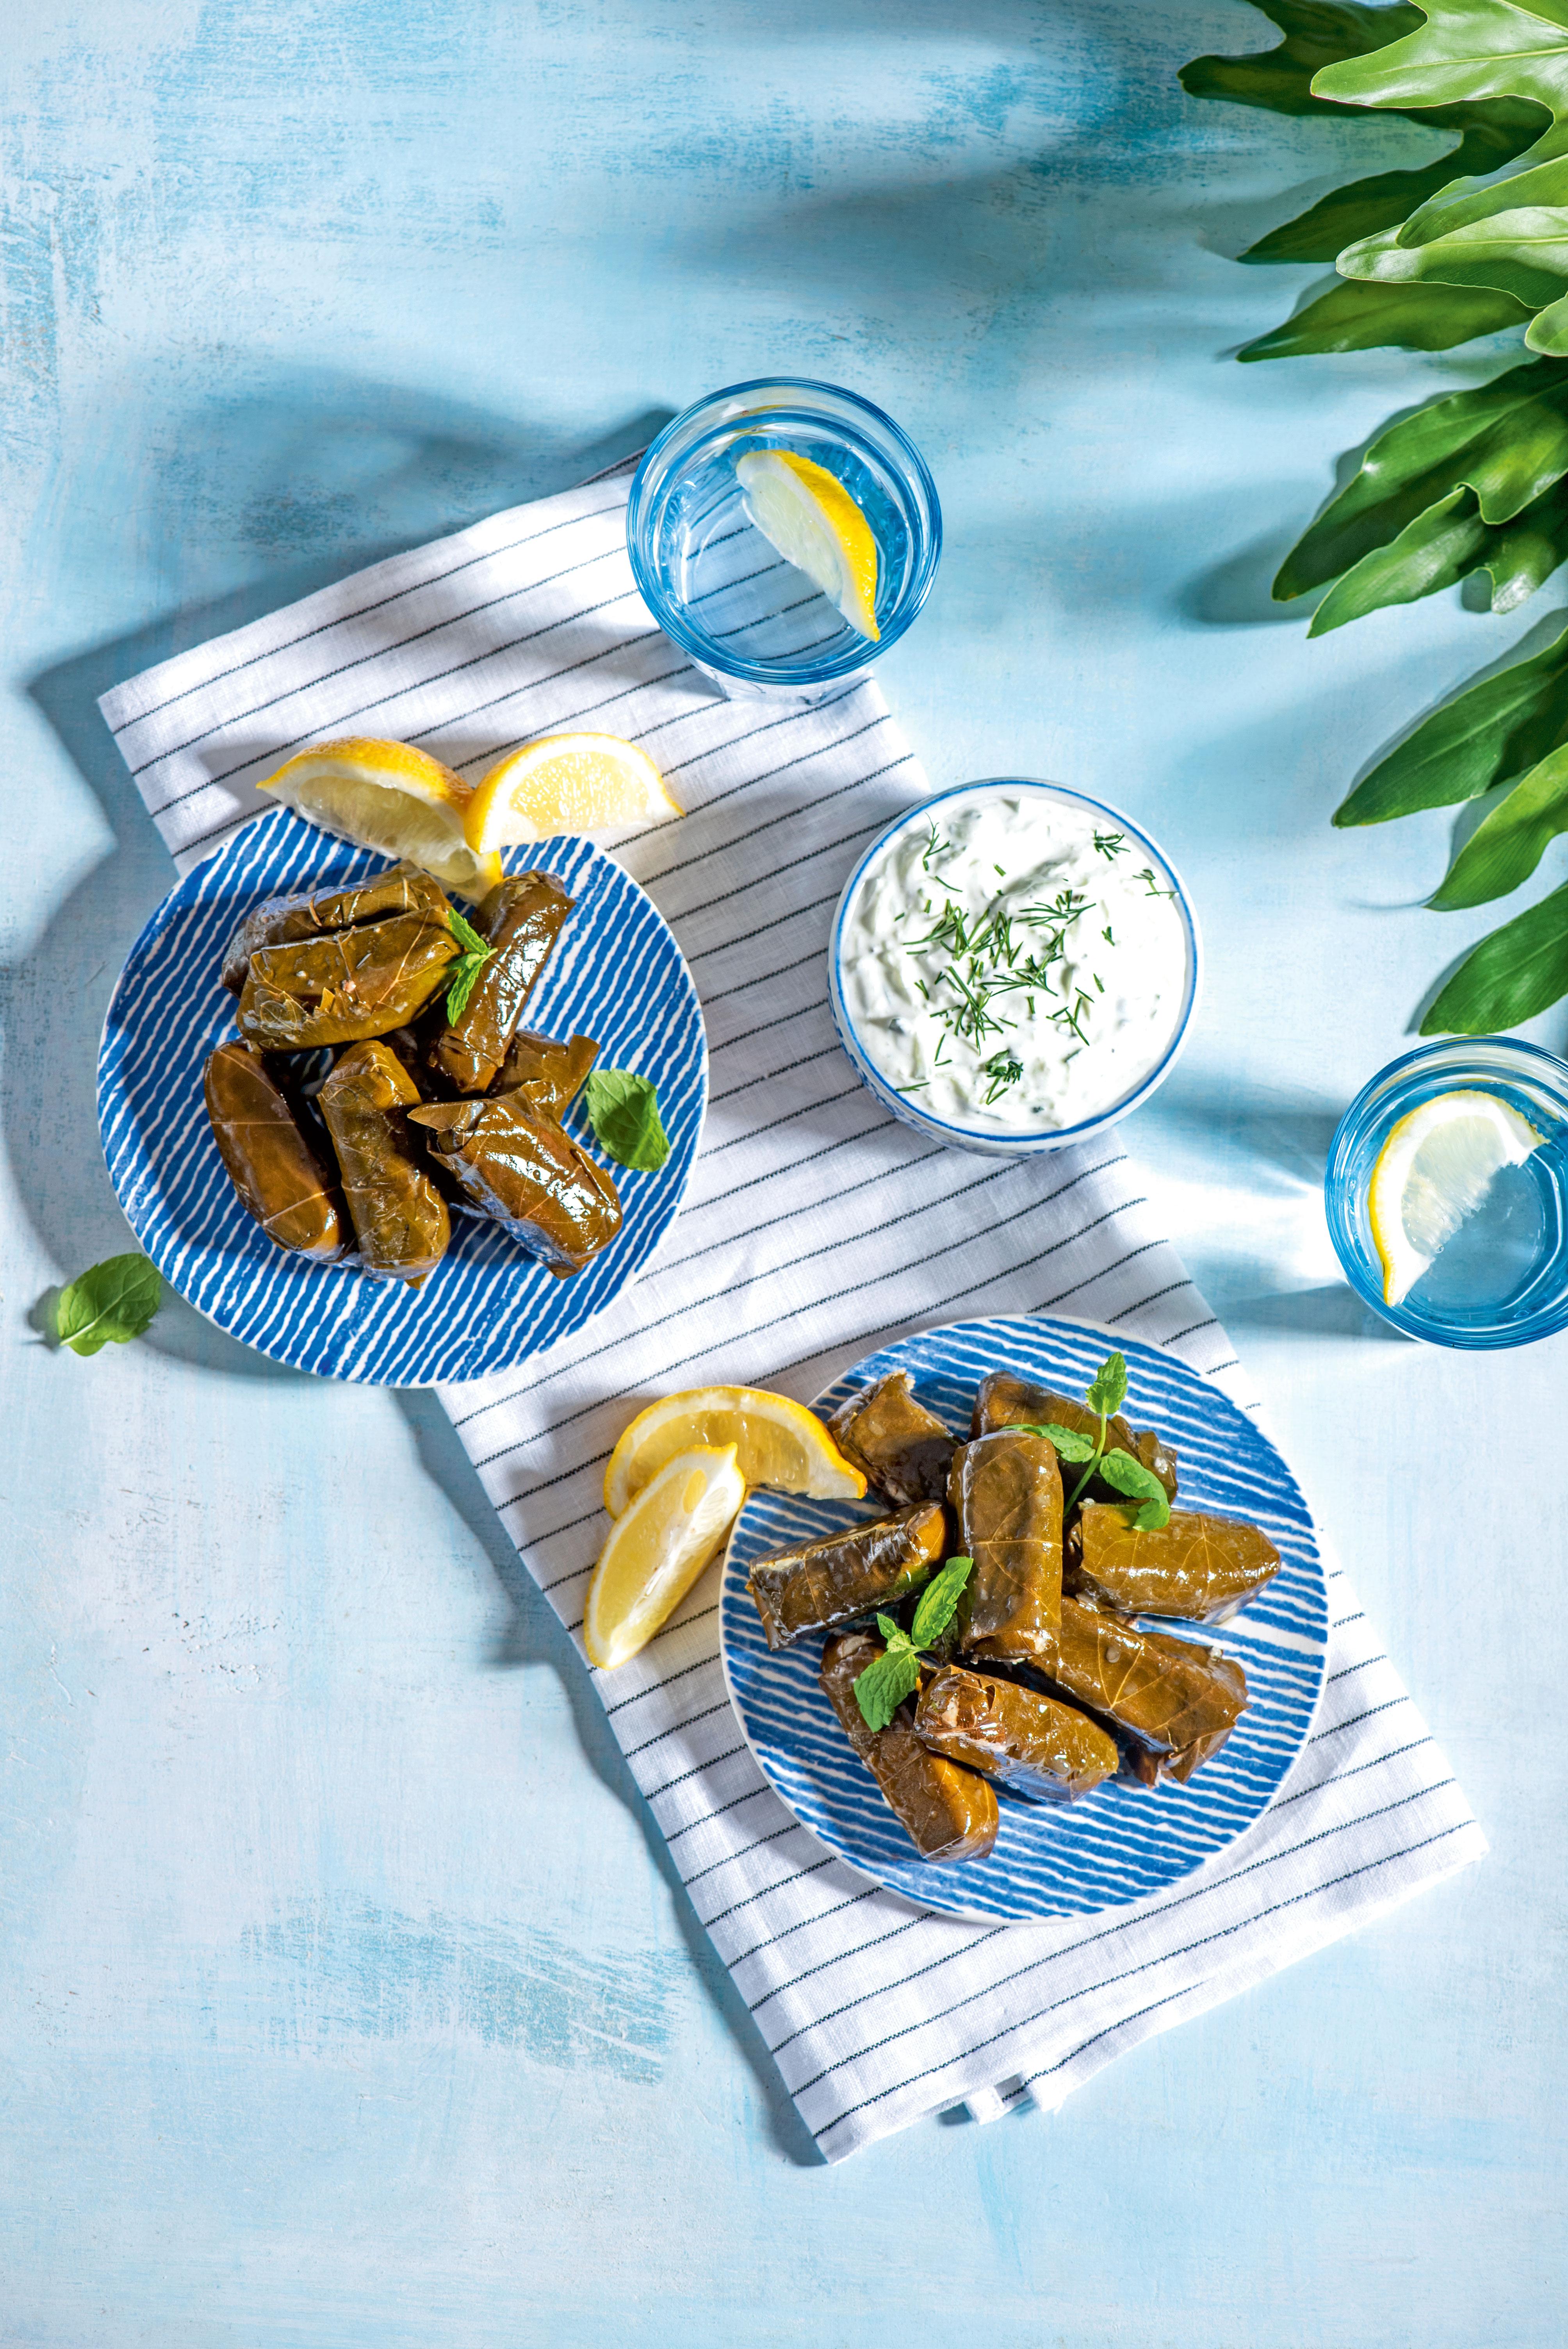 Kuchnia Grecka Sos Tzatziki Musaka Dolmadakia Przepisy